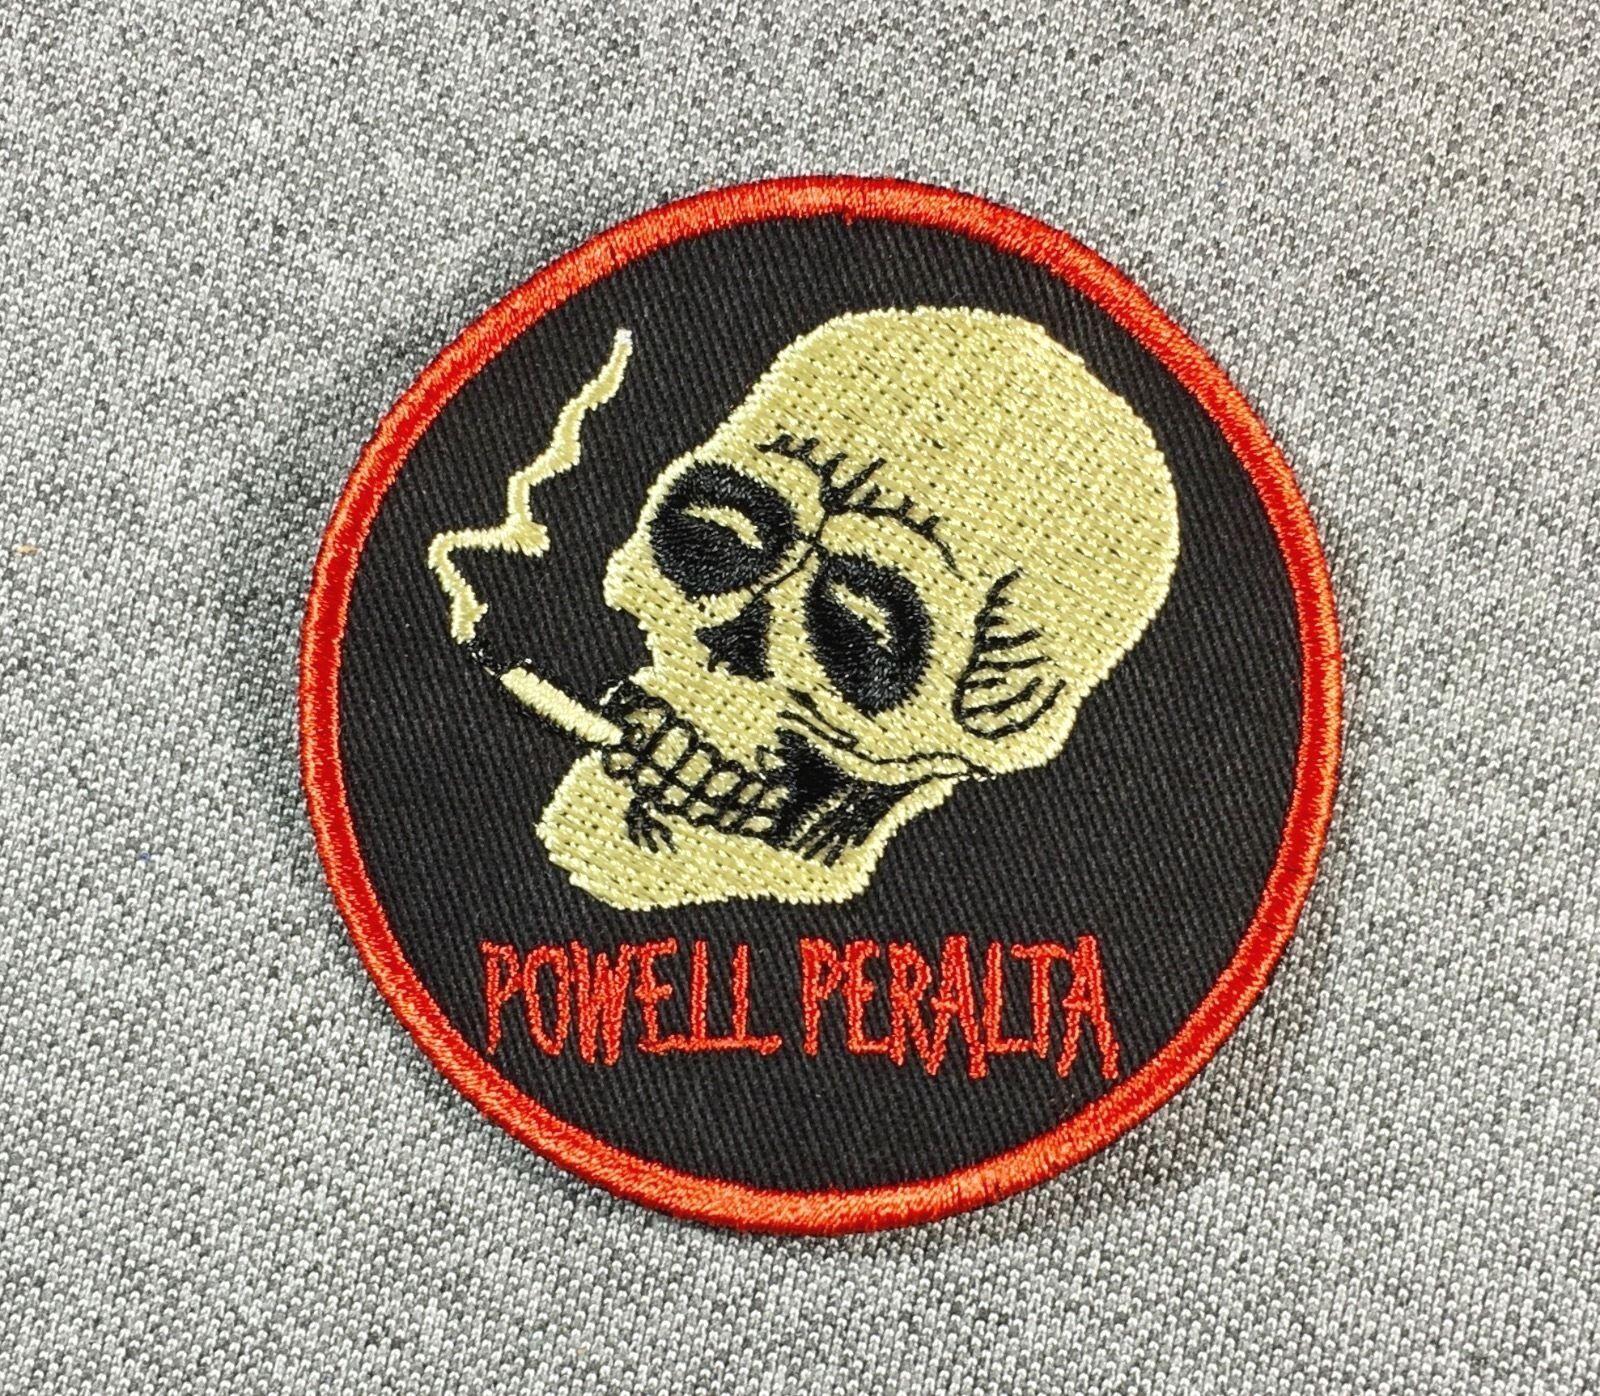 Powell Peralta Fumer 2.5in Crane Skateboard Patch 2.5in Fumer Patch à Coudre sur Si cb87eb